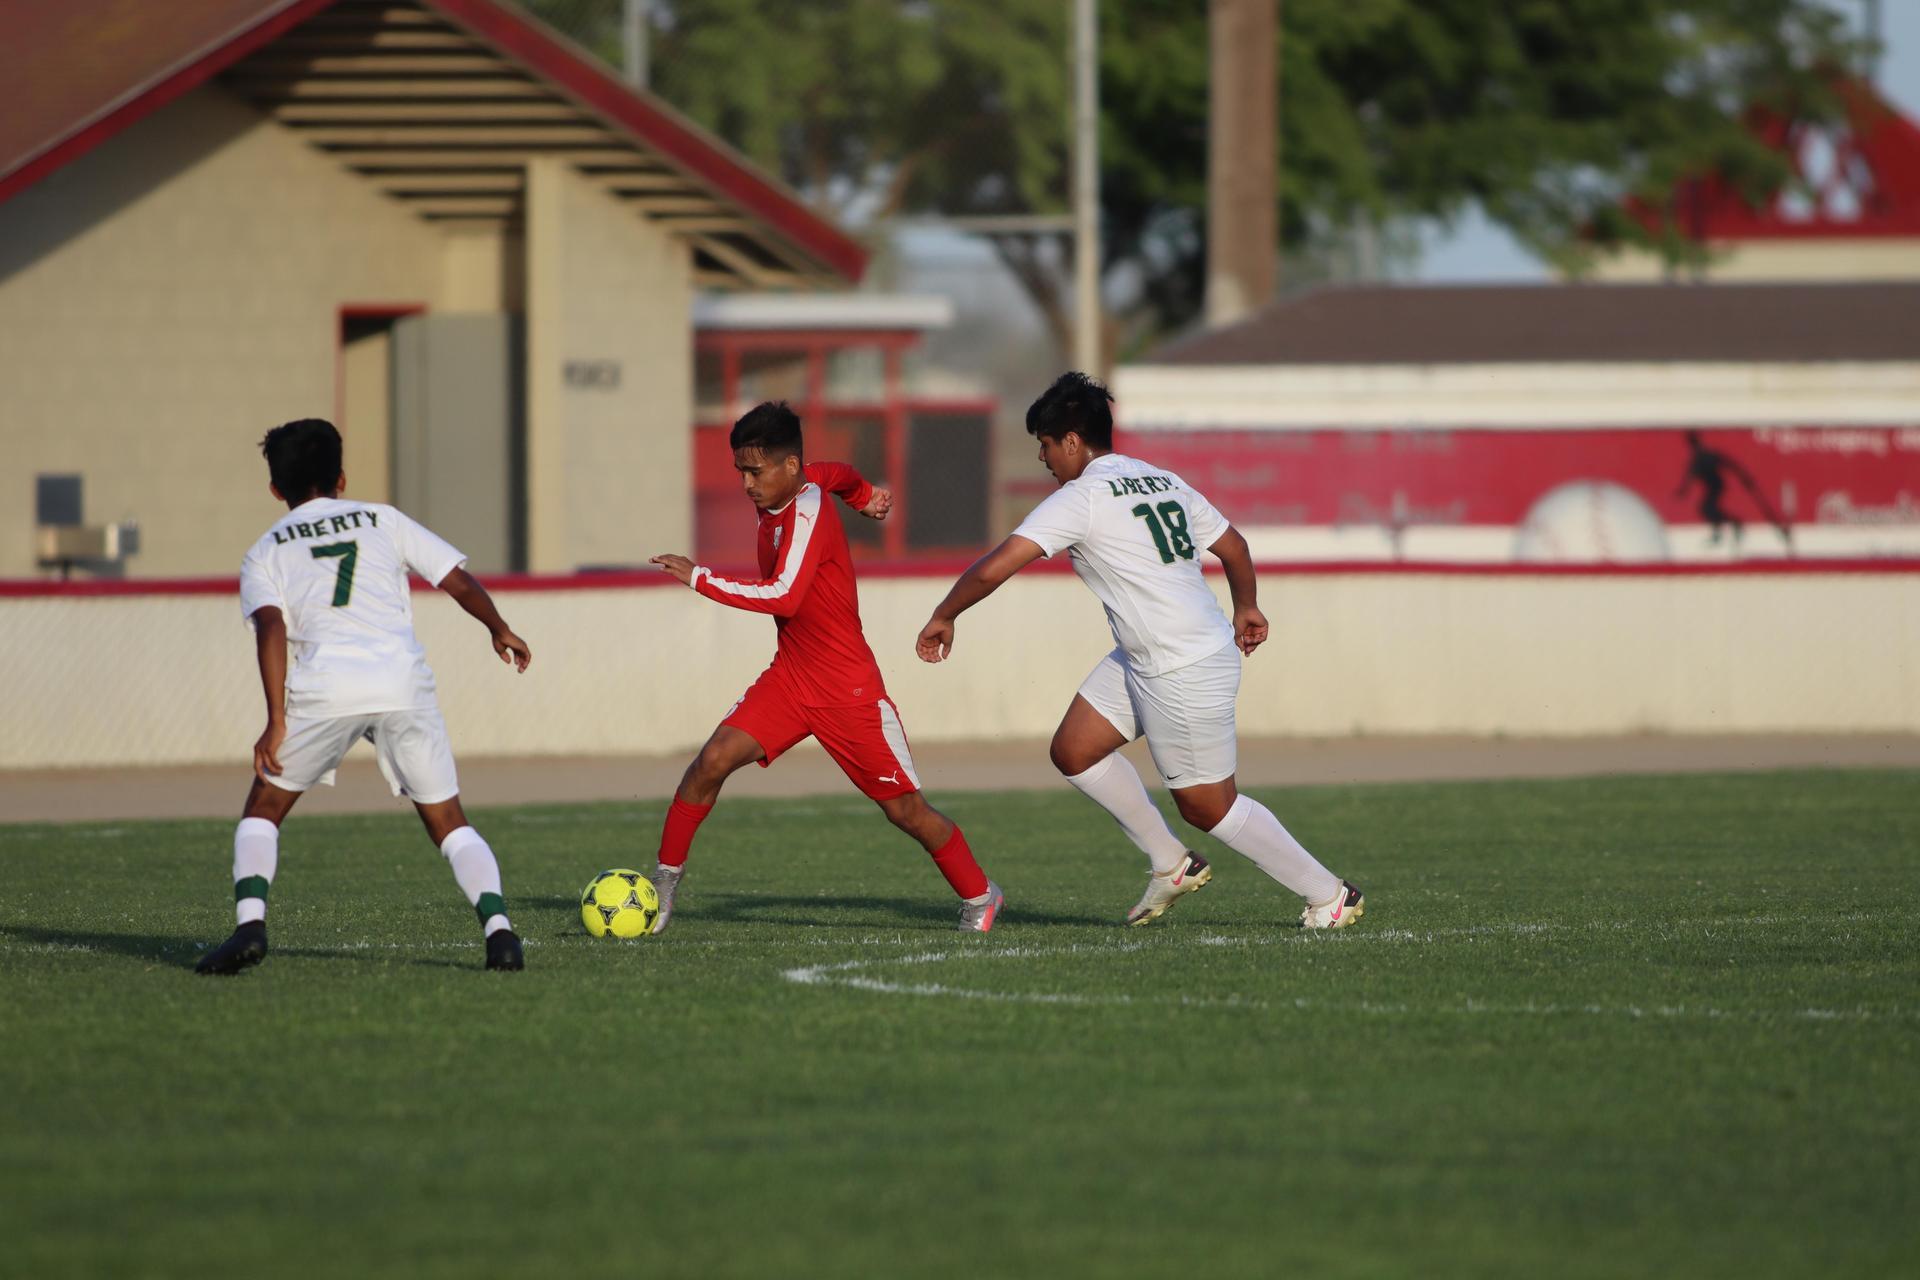 Boys playing soccer vs Liberty